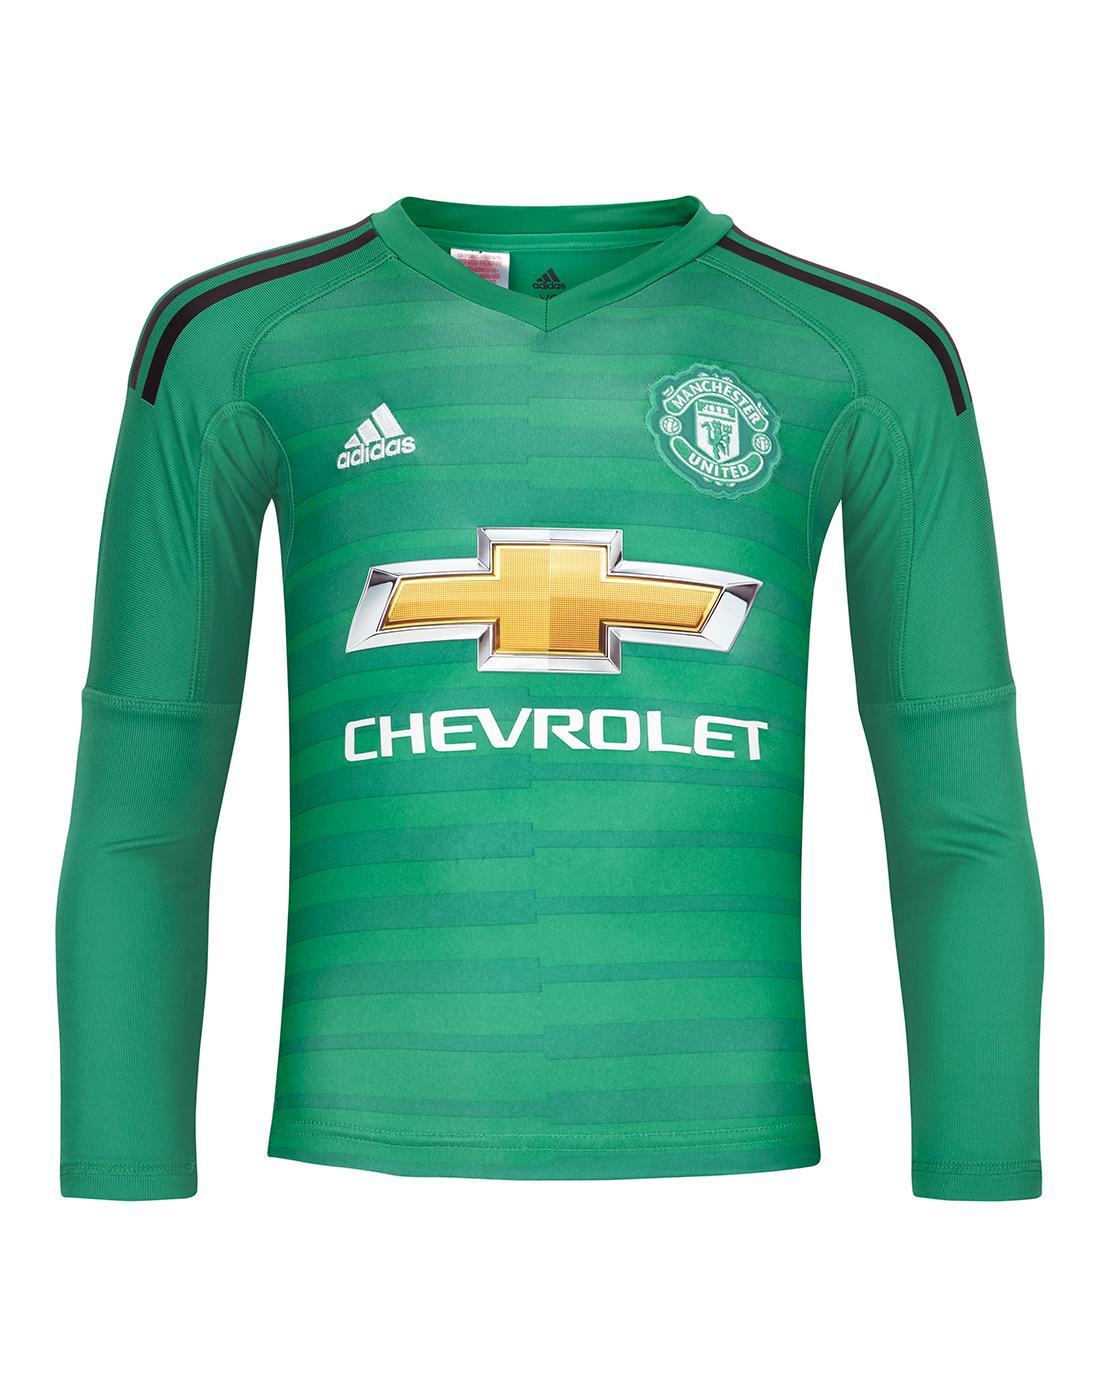 e14313bef59 Kids Man United 18 19 Goalkeeper Home Jersey